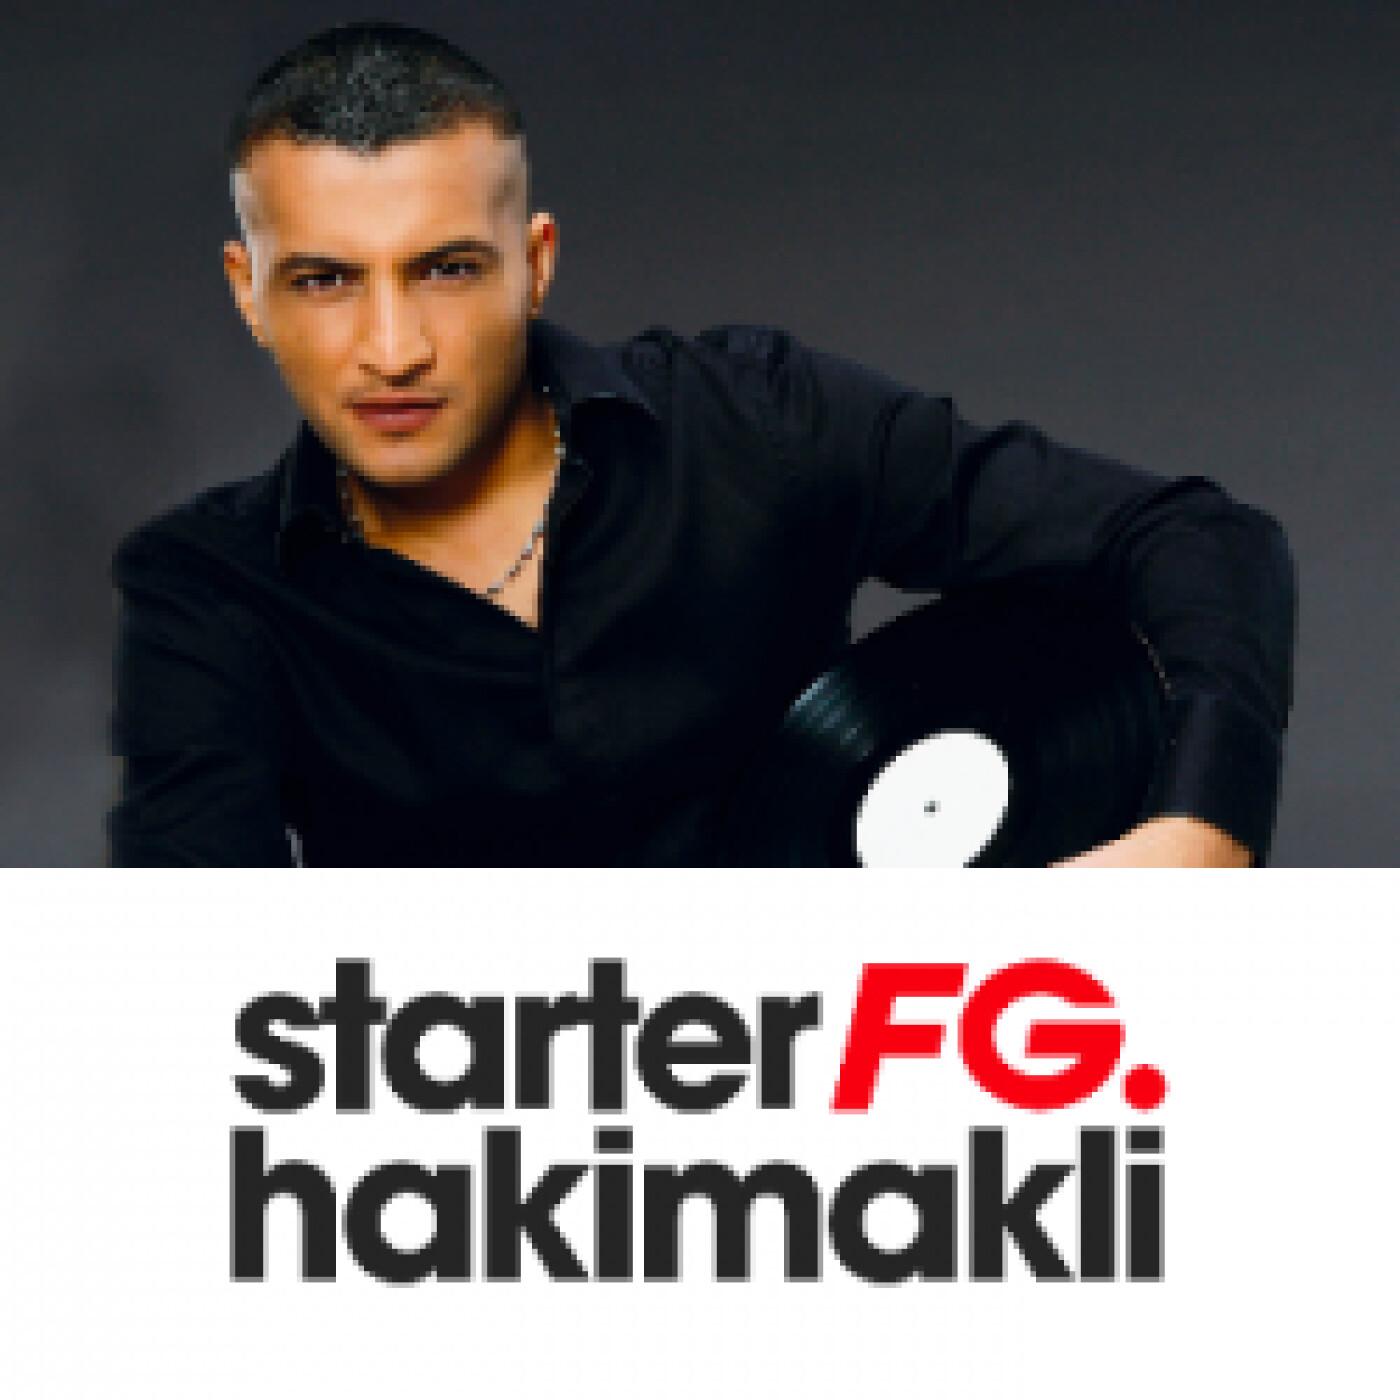 STARTER FG BY HAKIMAKLI JEUDI 24 JUIN 2021